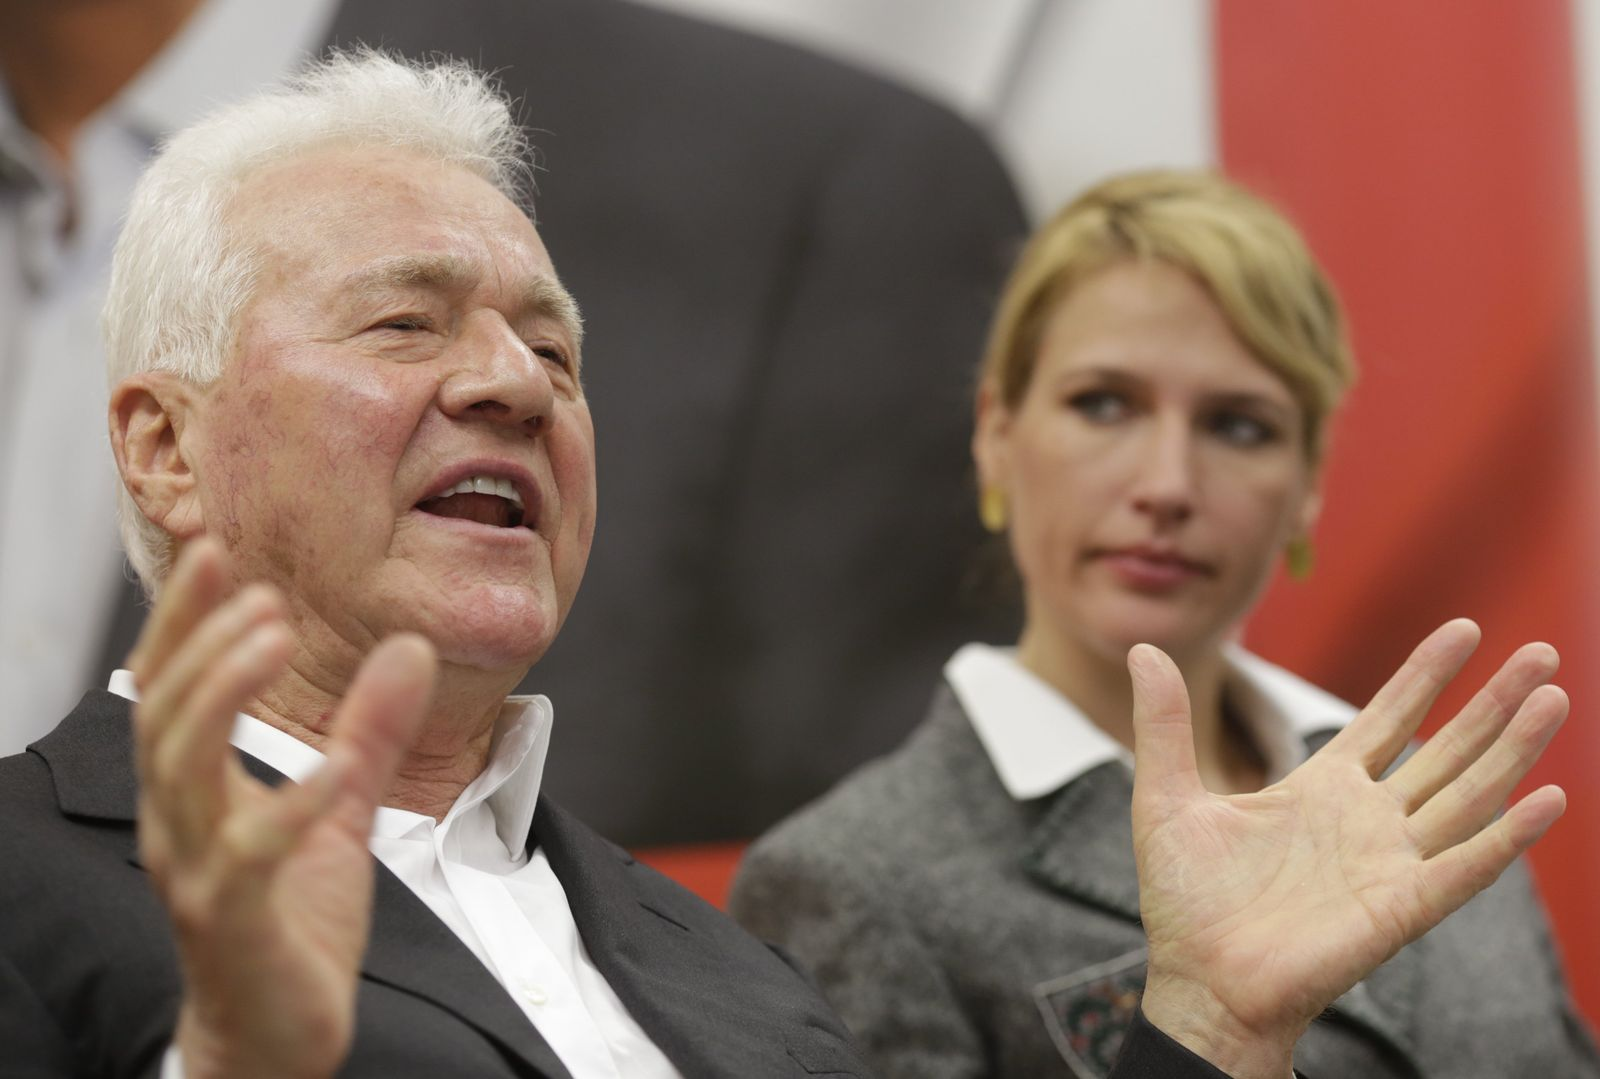 AUSTRIA-POLITICS/STRONACH